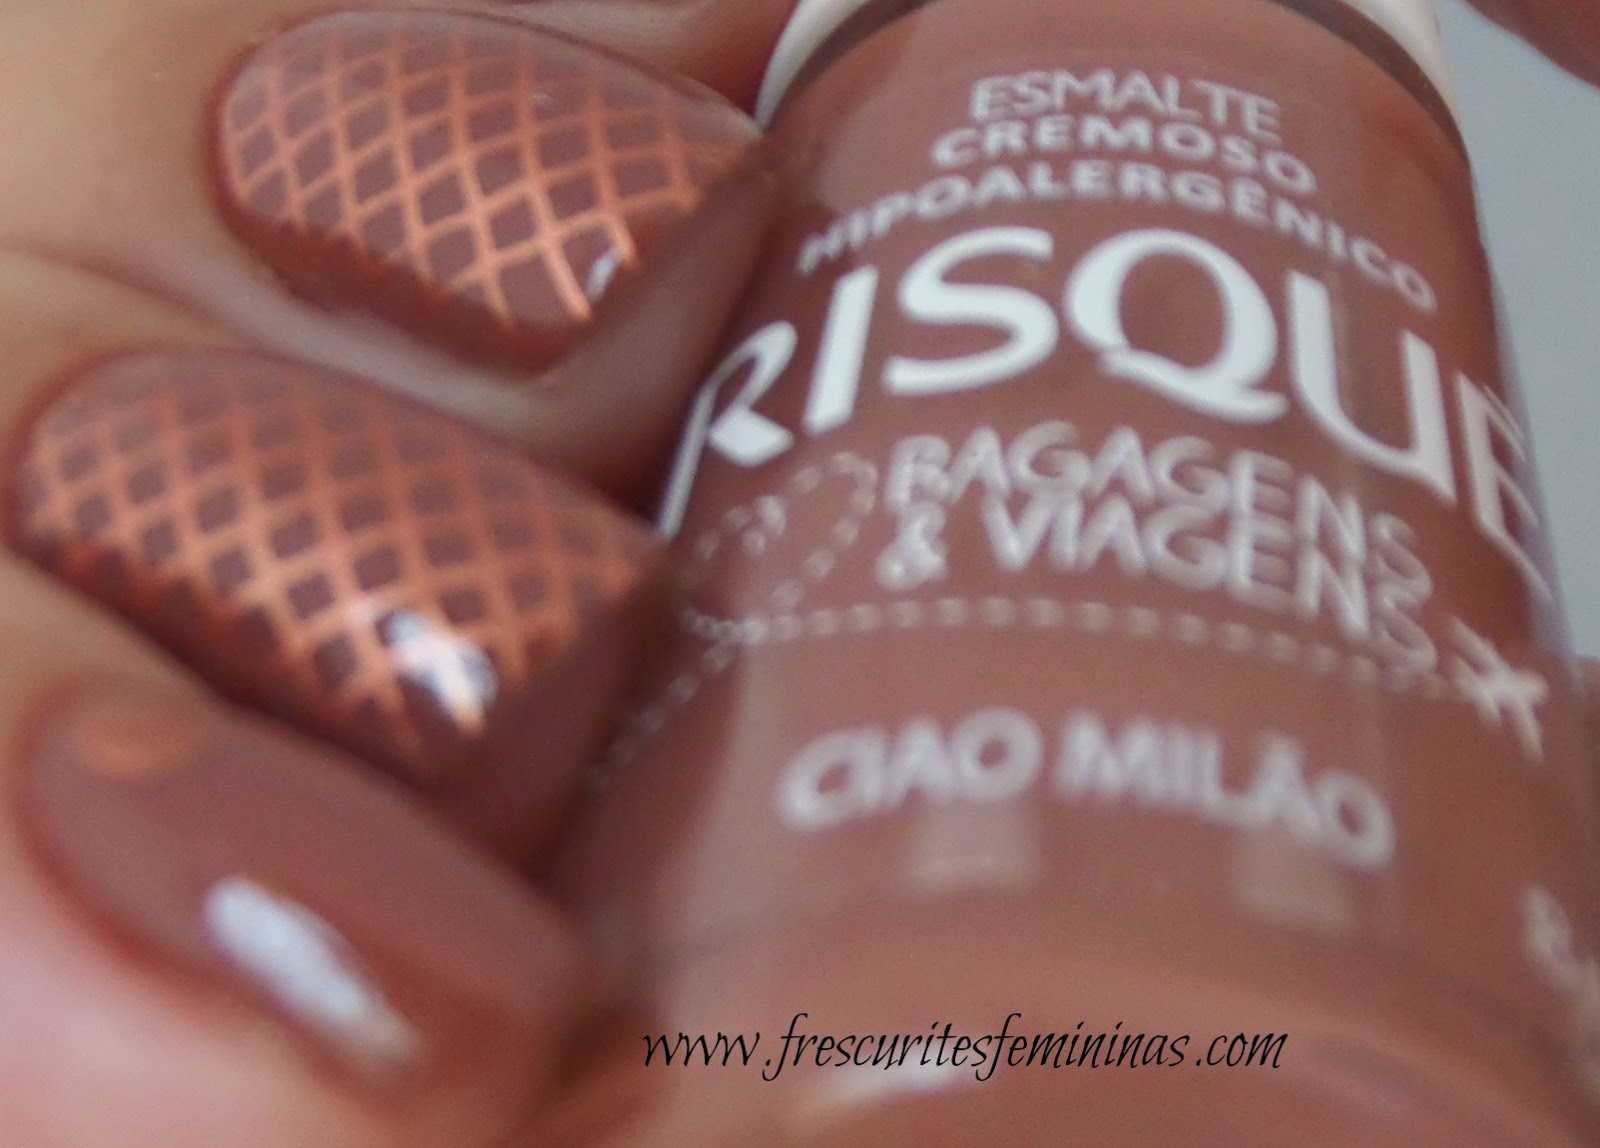 Risqué, Esmalte Risque, Ciao Milão, Mundo de unhas, Mundo de Uñas, Copper, Stamp nail polish